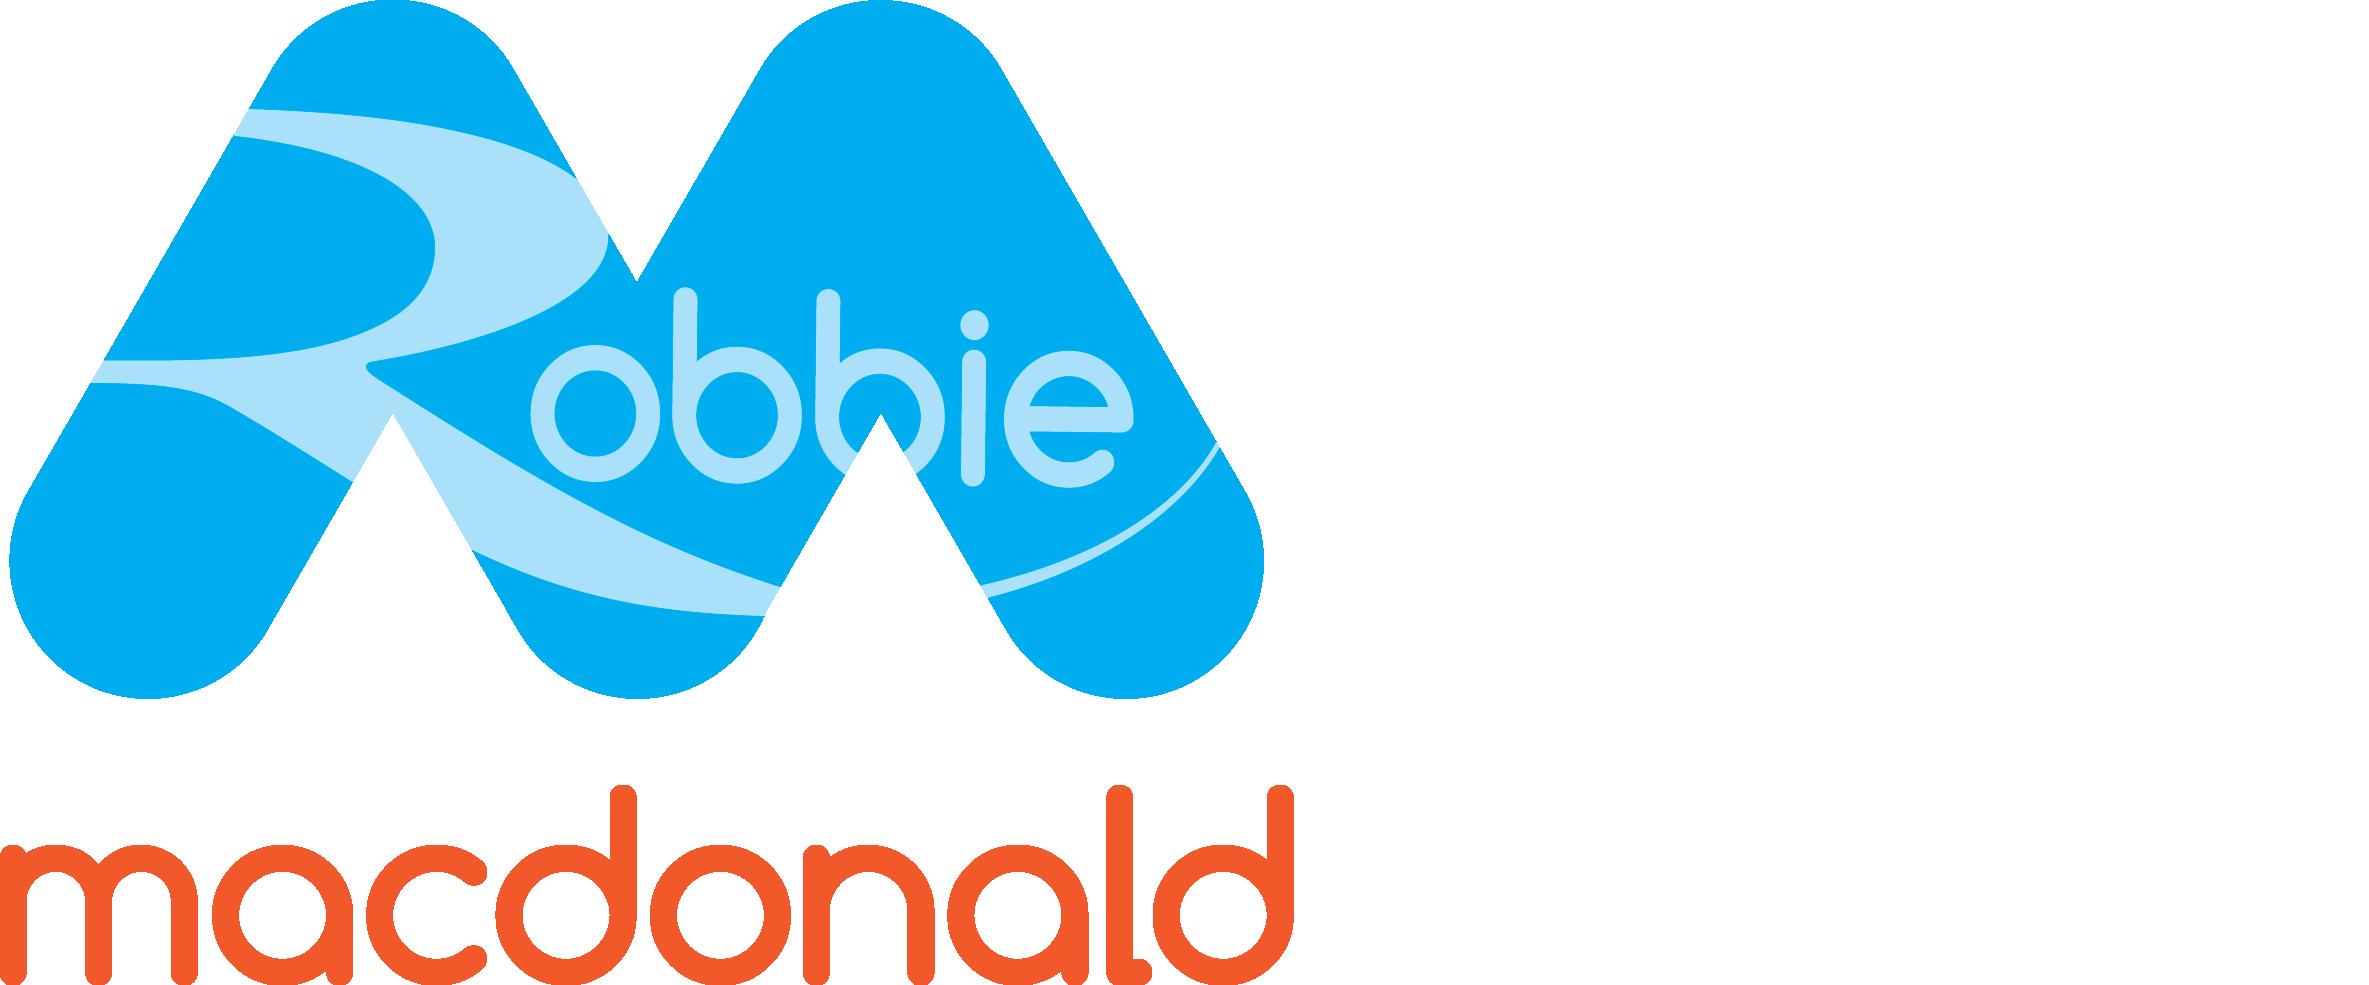 Robbie MacDonald